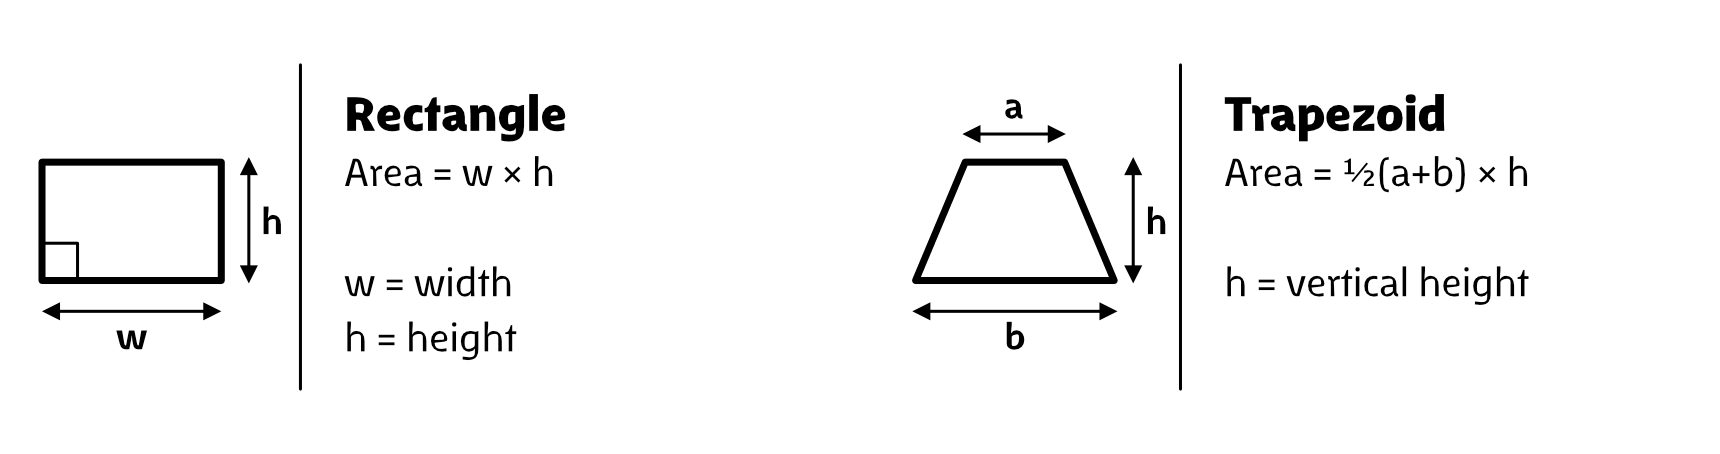 Image-Measure-2